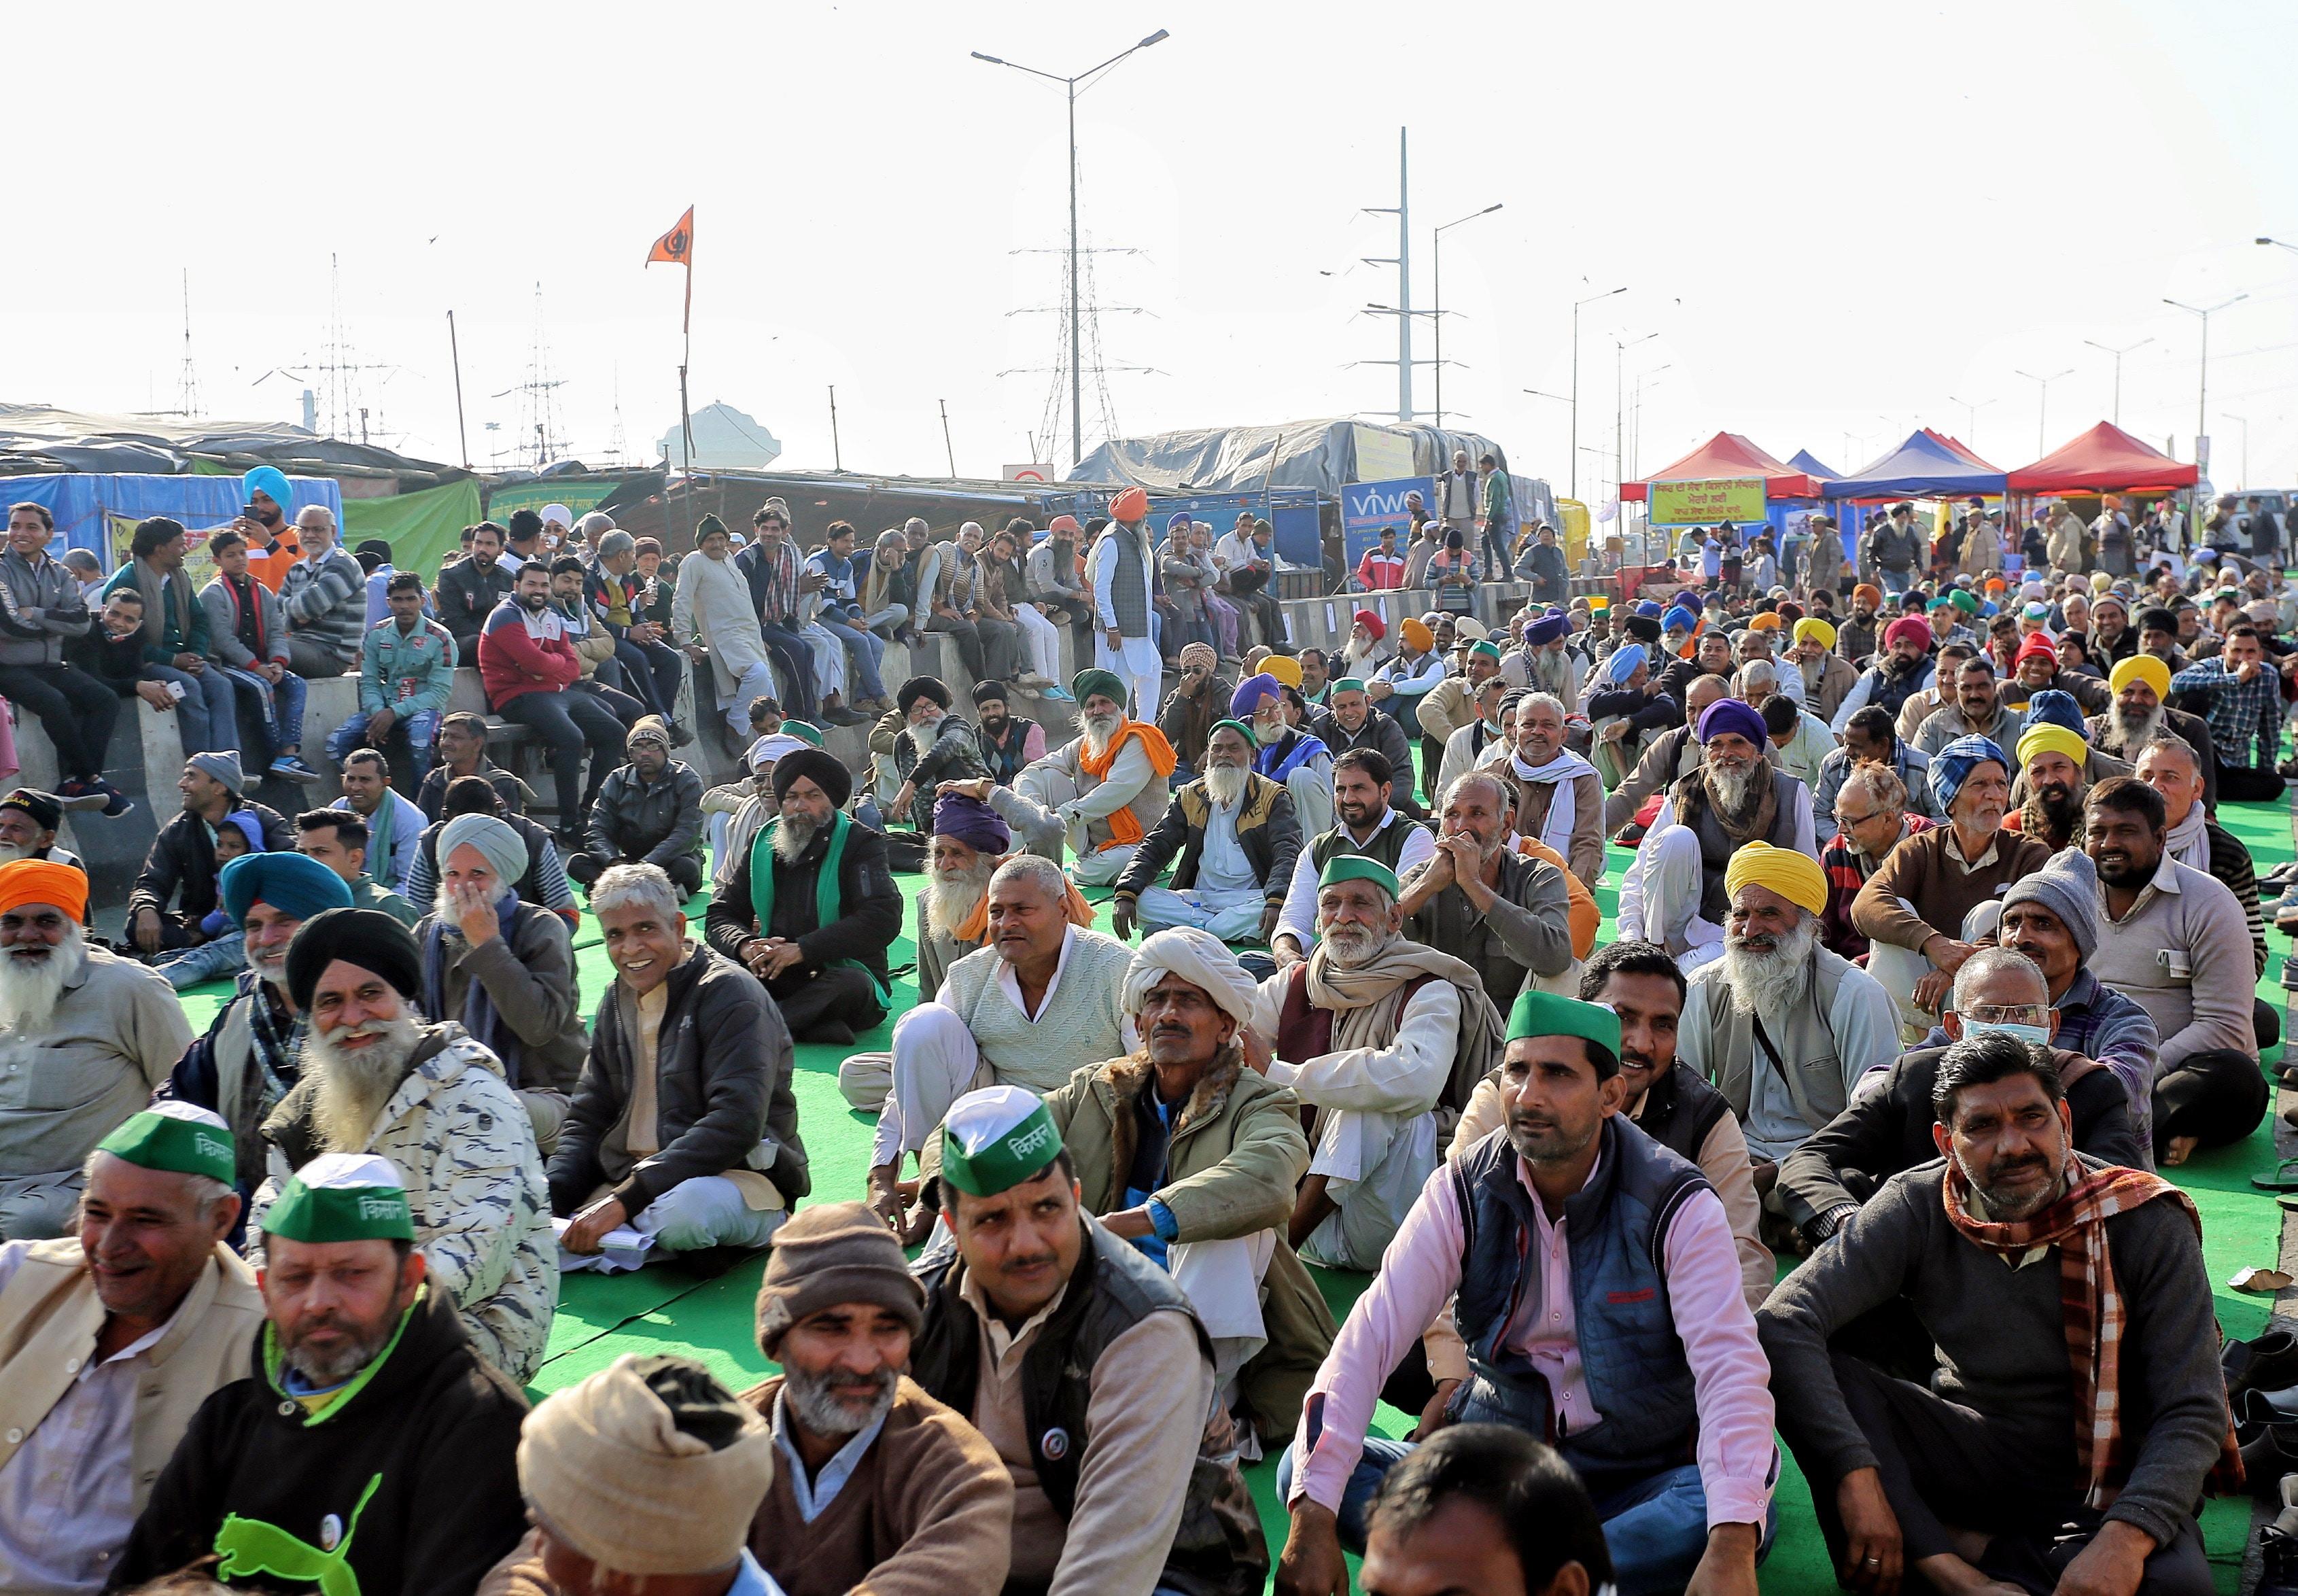 Polisi Delhi telah menyetujui parade traktor pada 26 Januari, klaim para petani thumbnail